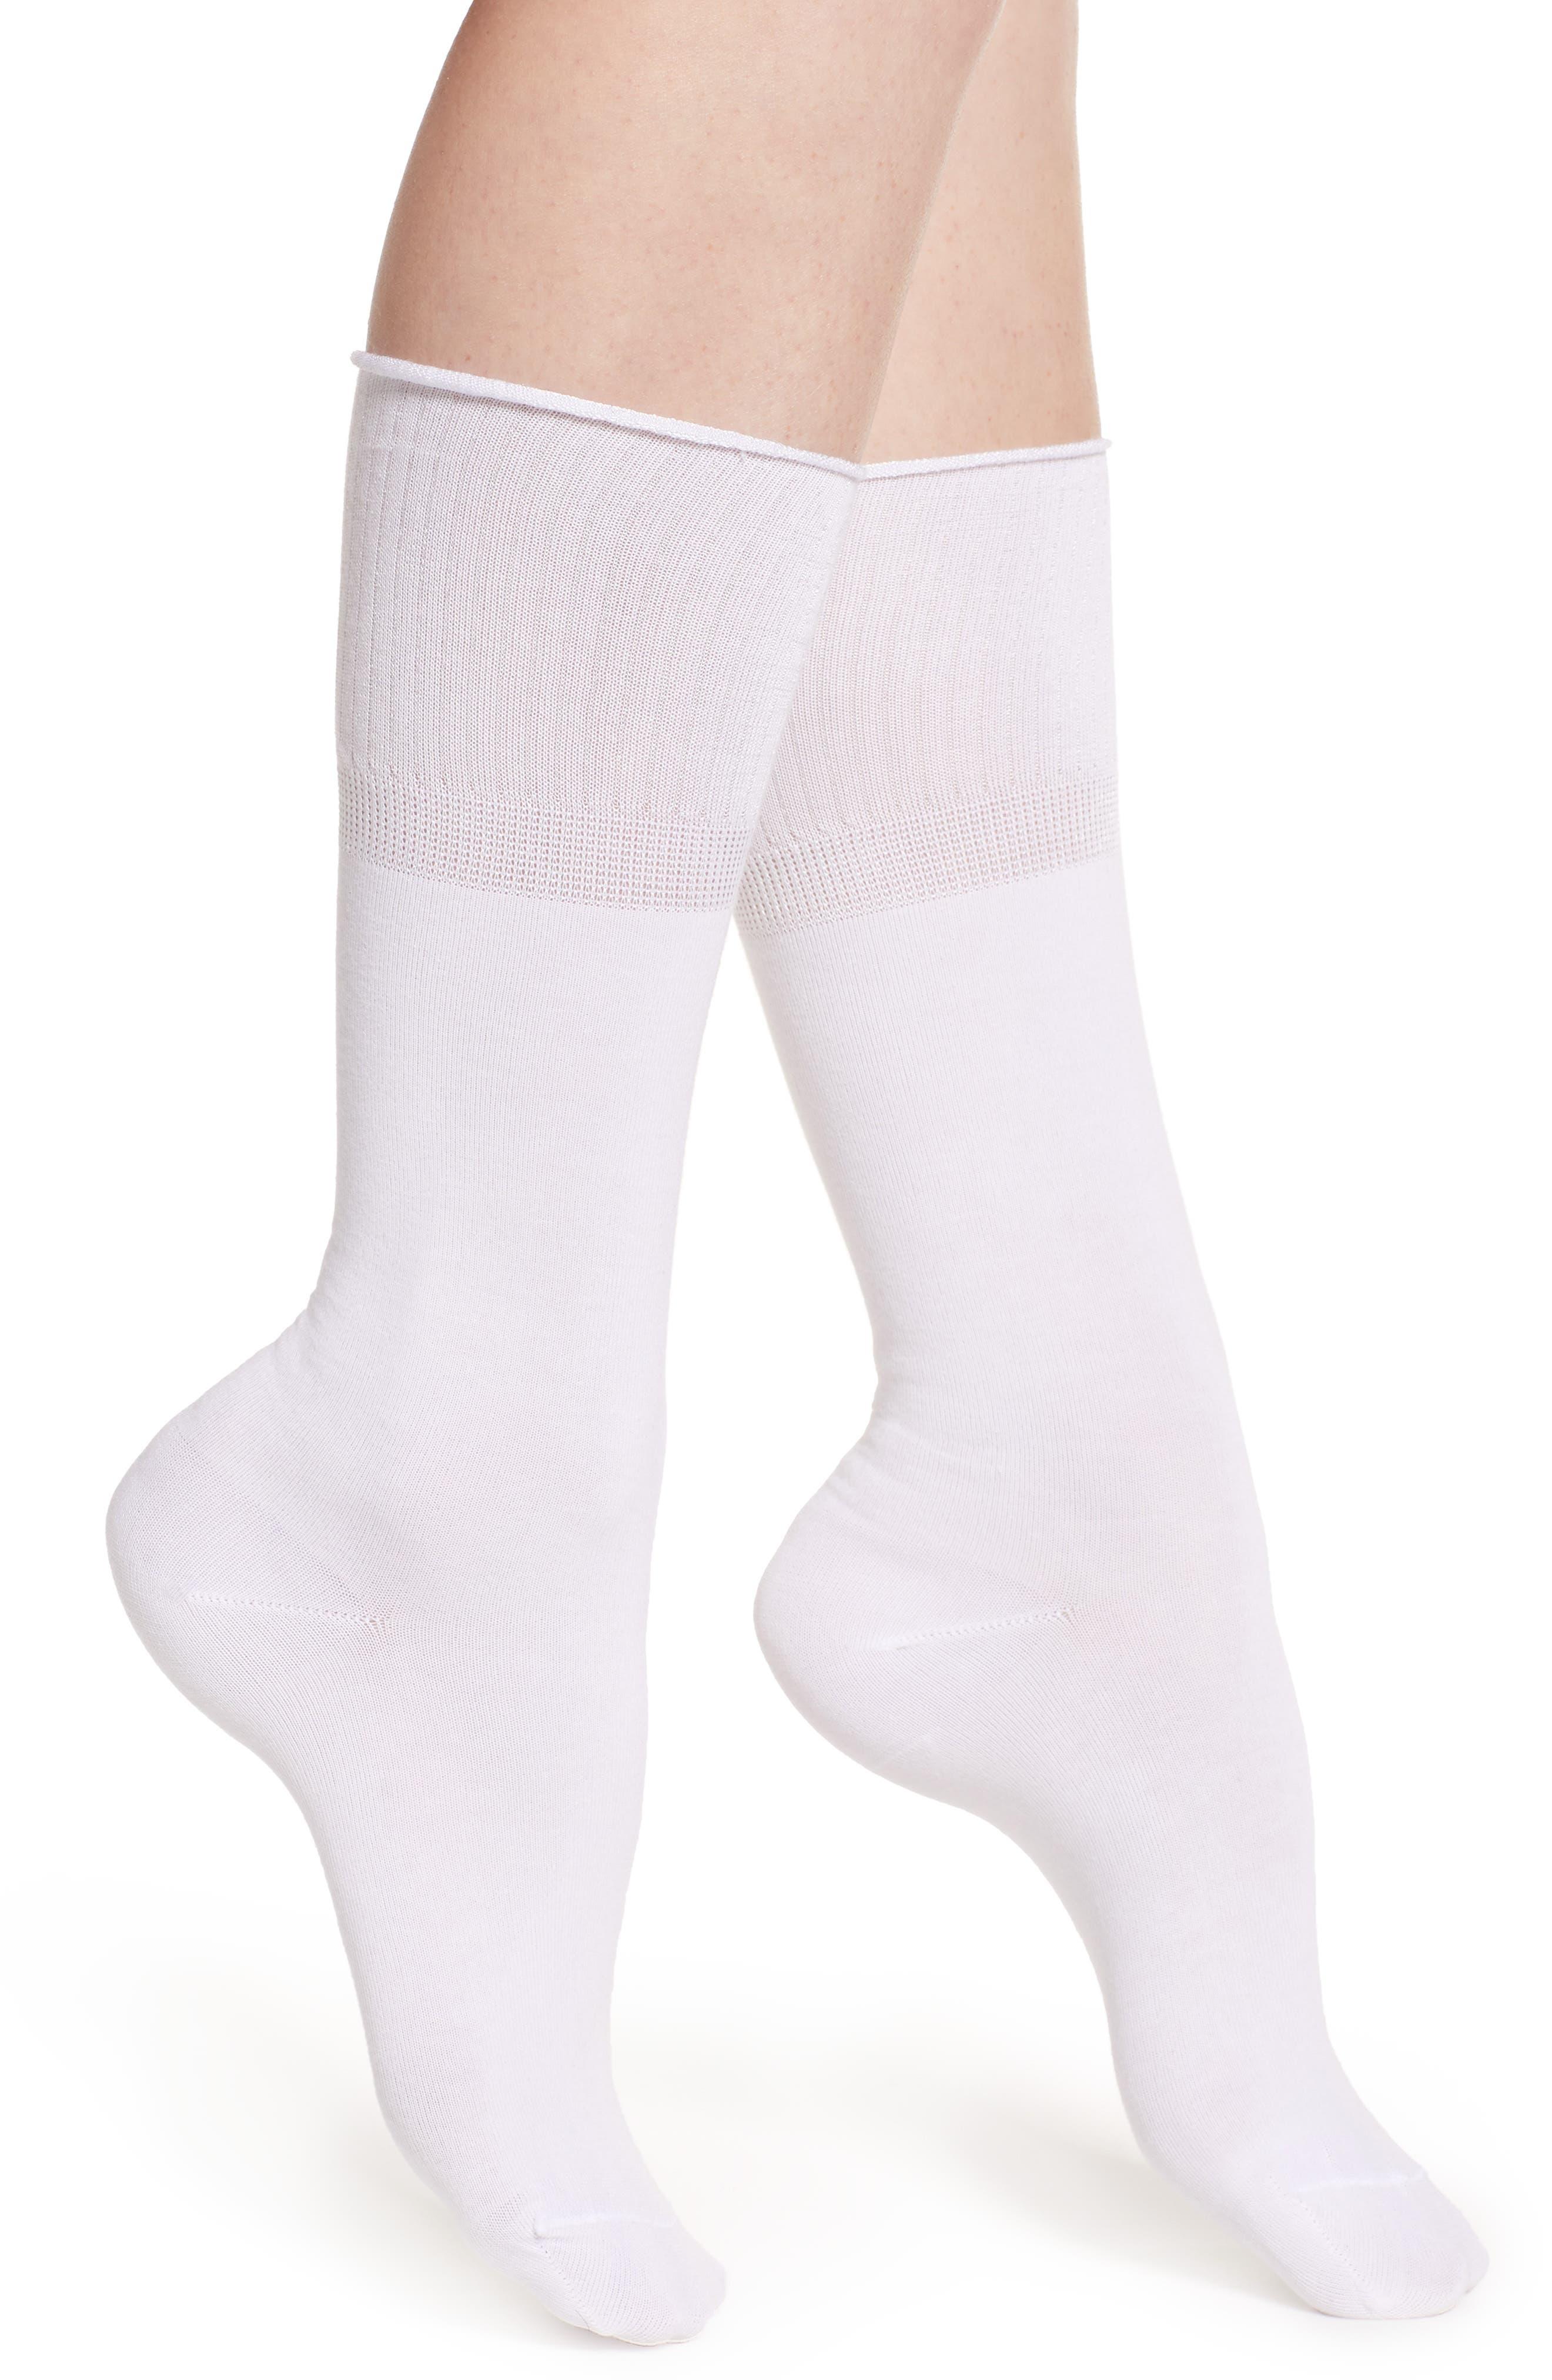 MAKE + MODEL Dual Band Crew Socks, Main, color, WHITE